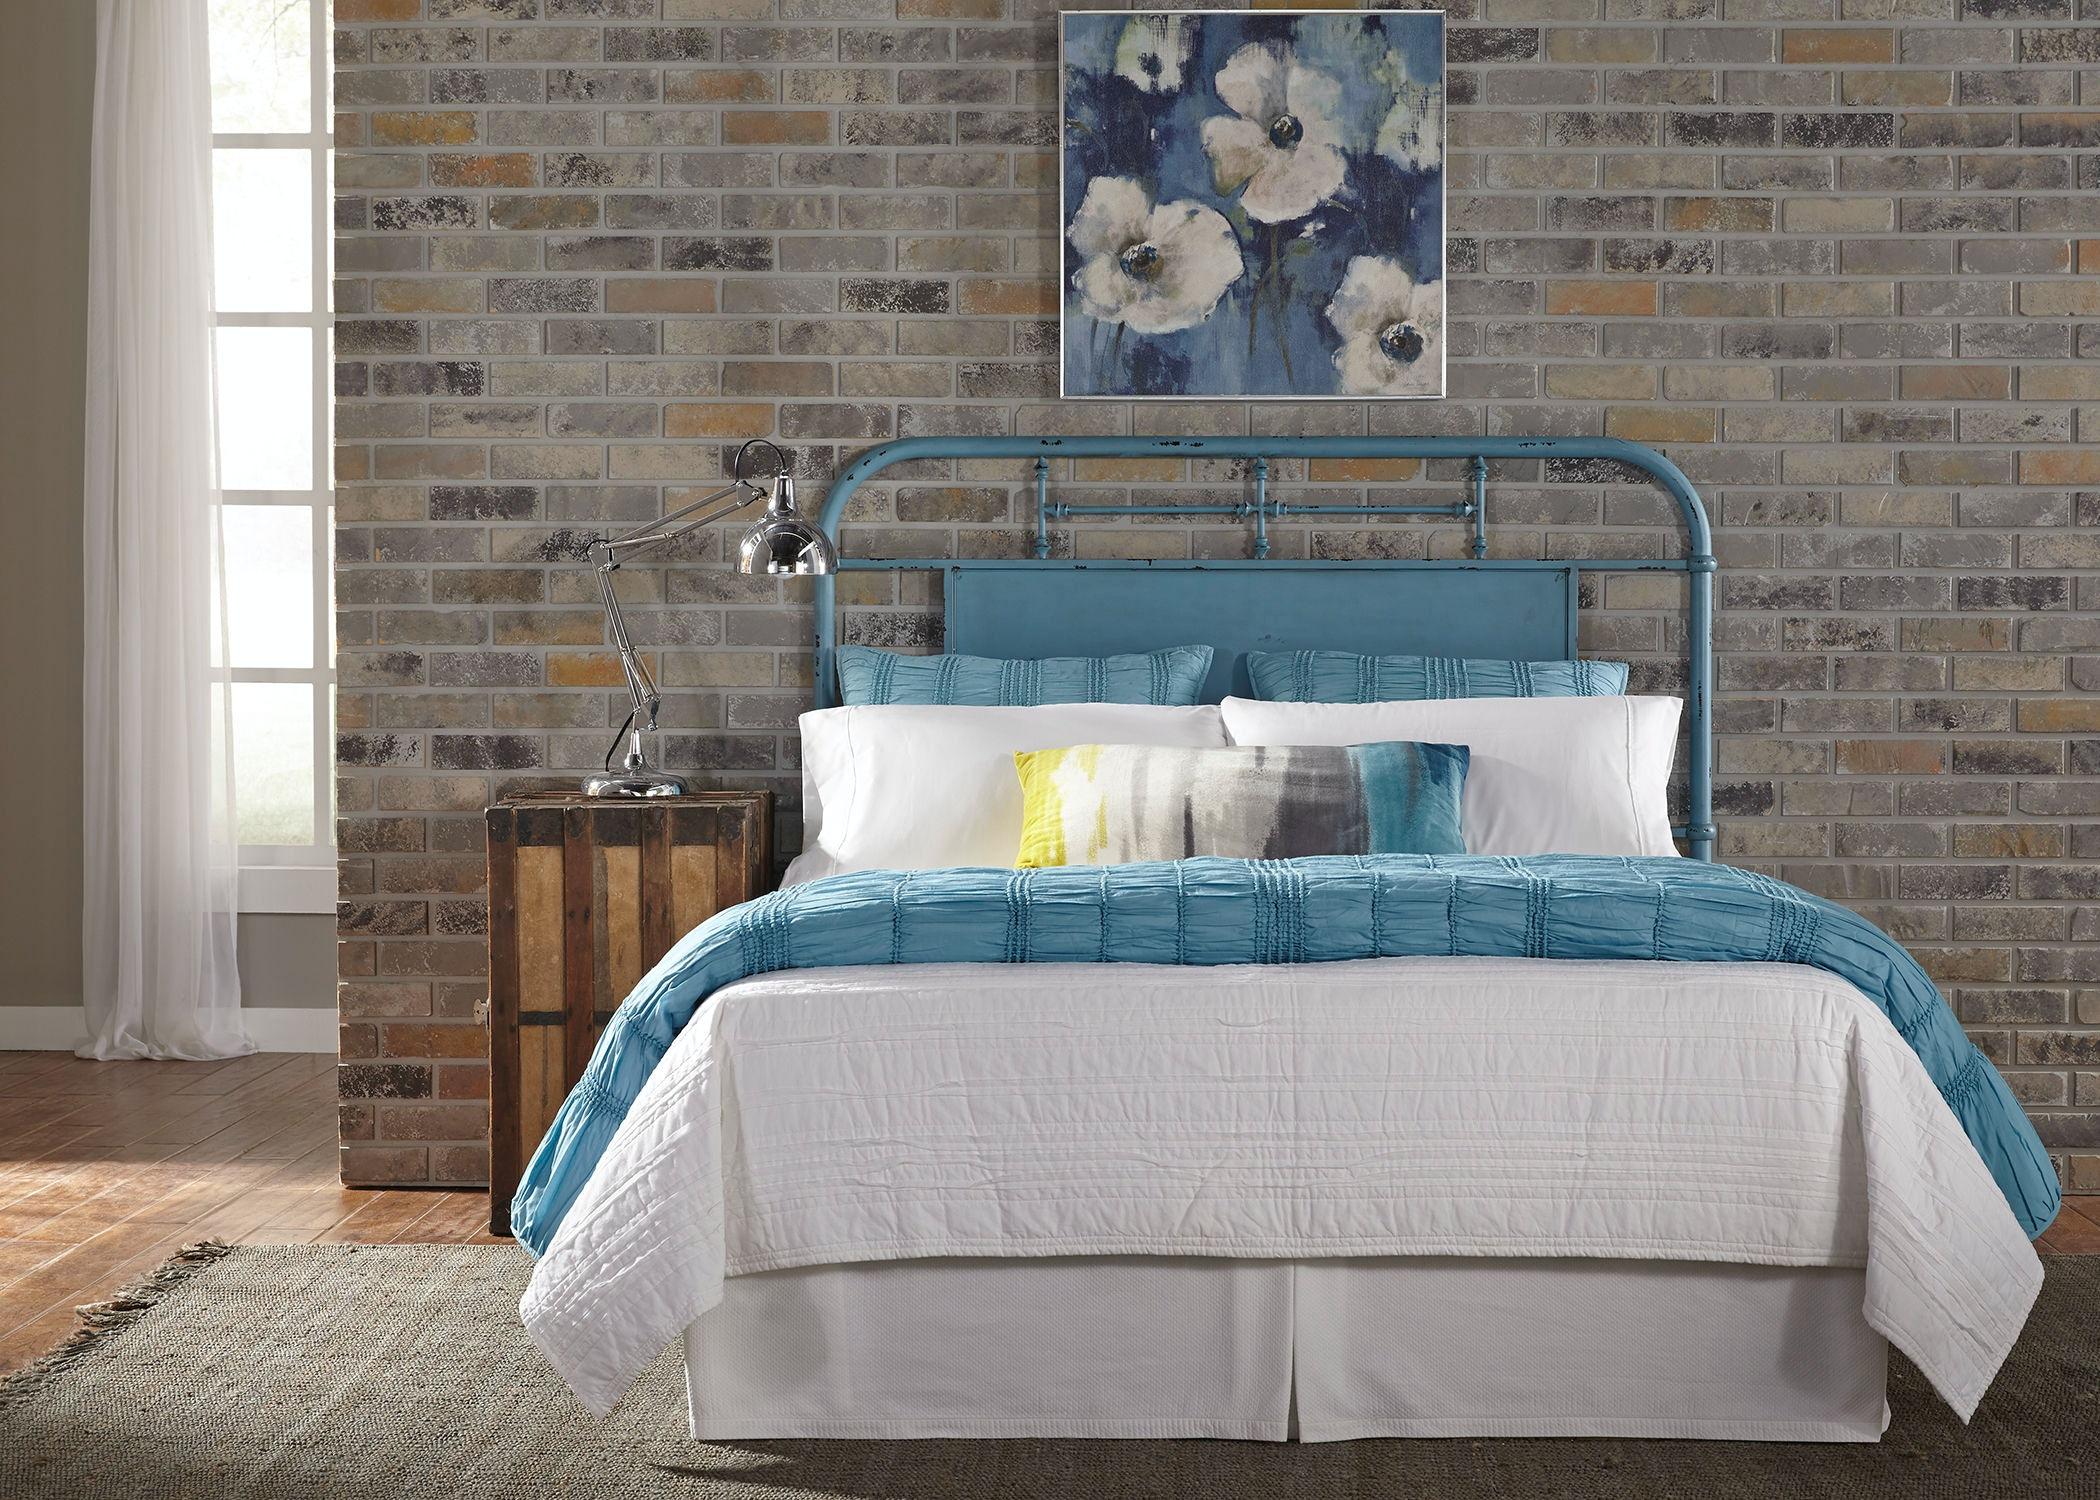 Liberty furniture bedroom king metal headboard blue details classic vintage styling